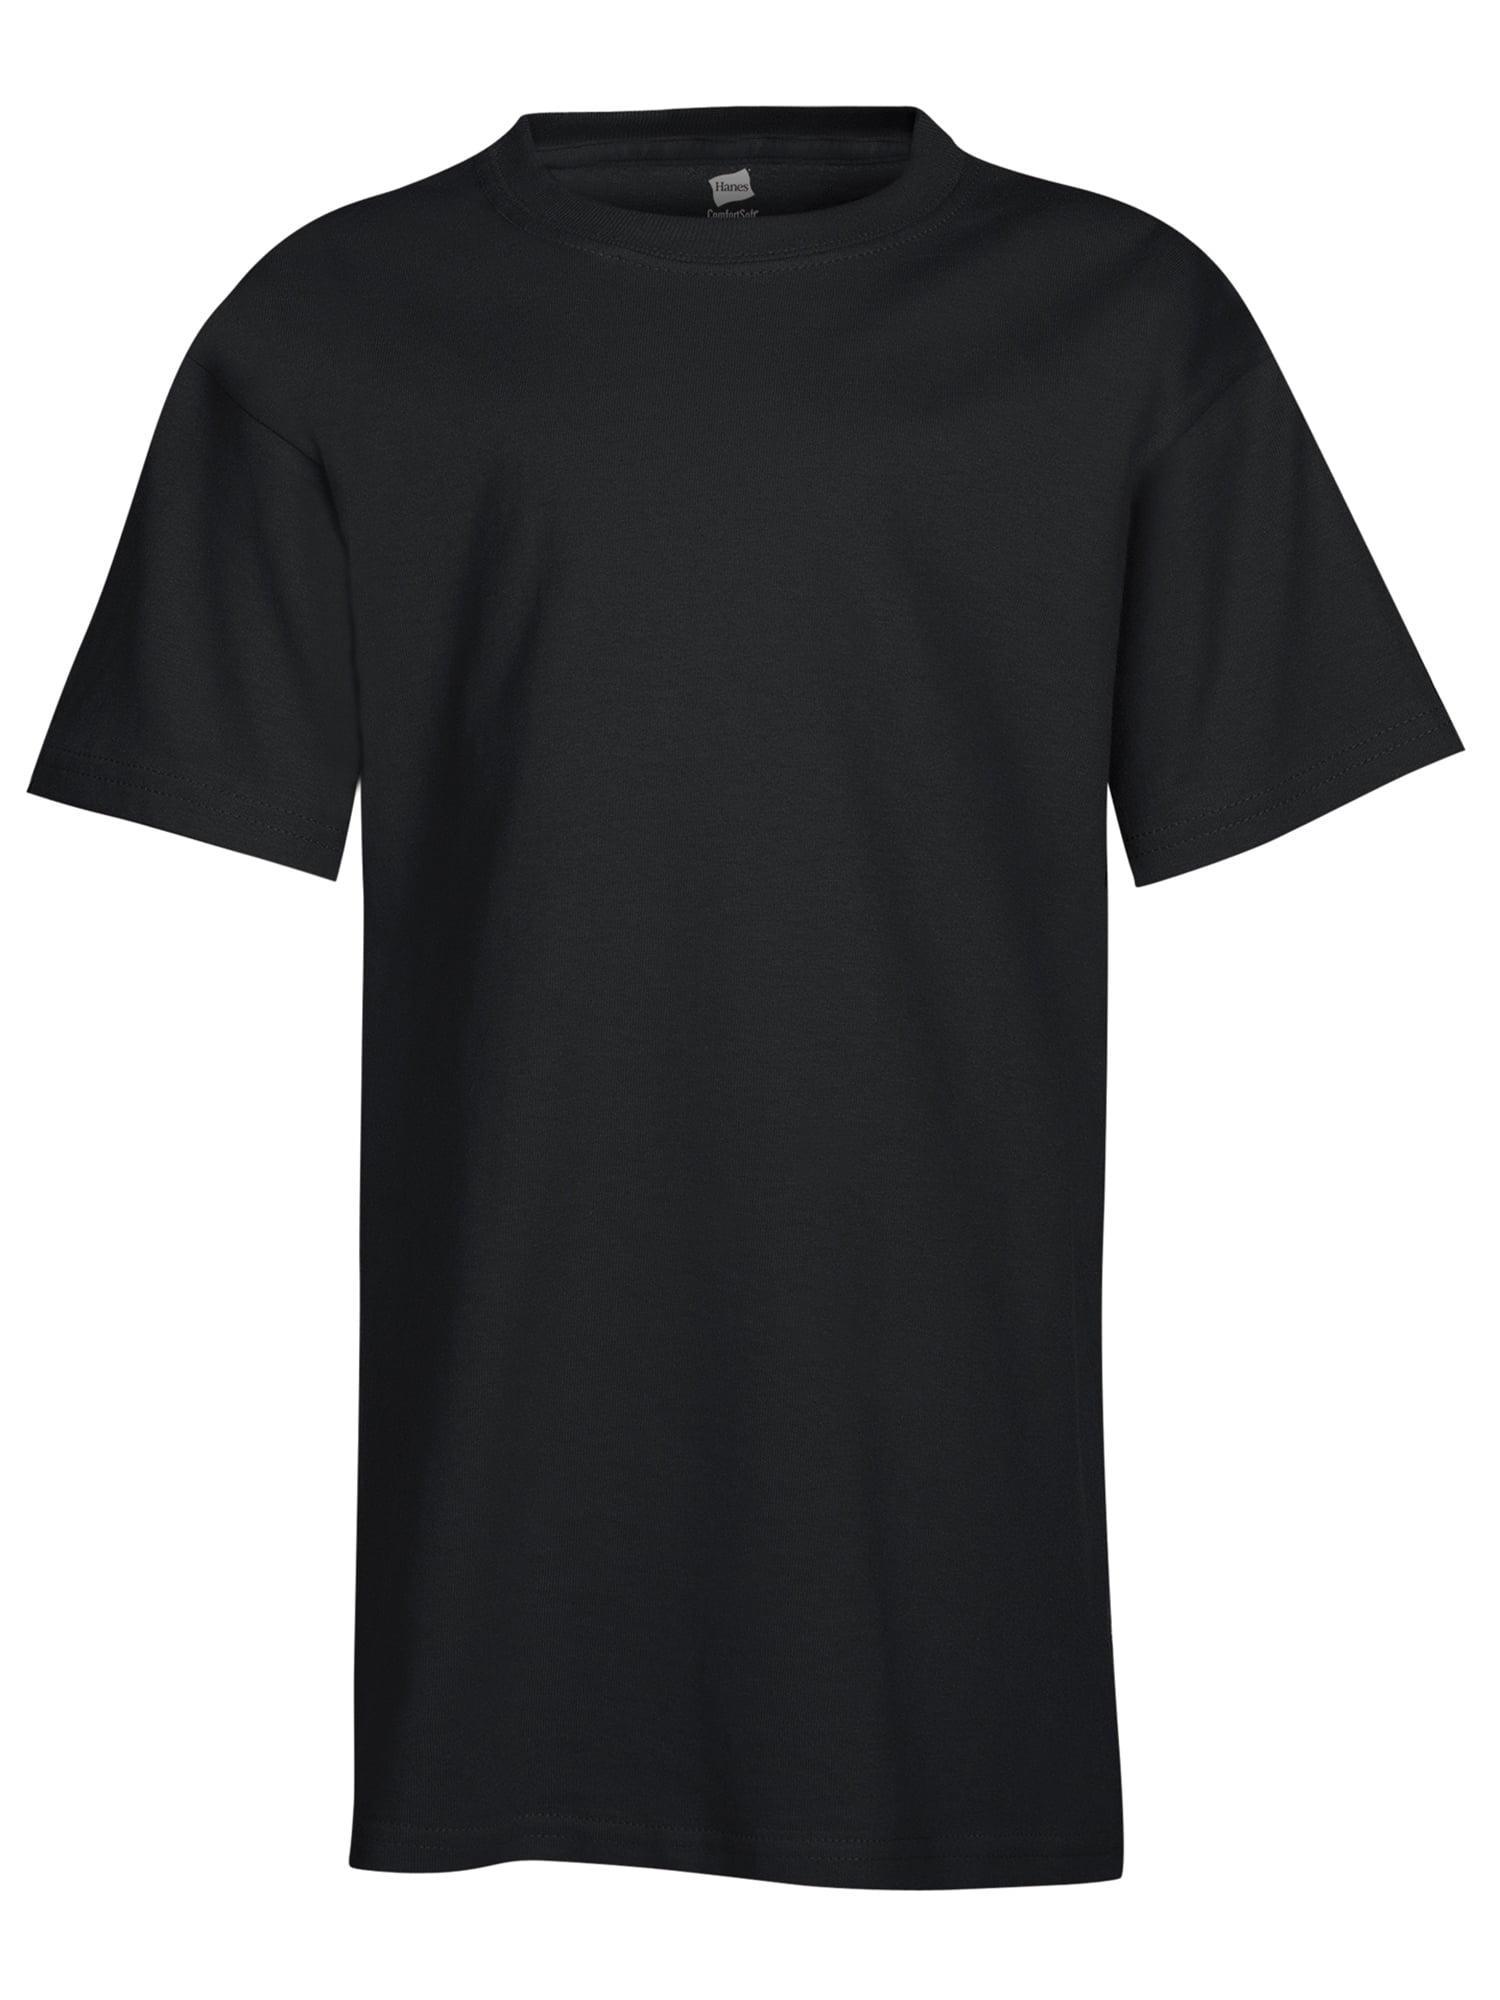 Boys' ComfortSoft Short Sleeve T-Shirt